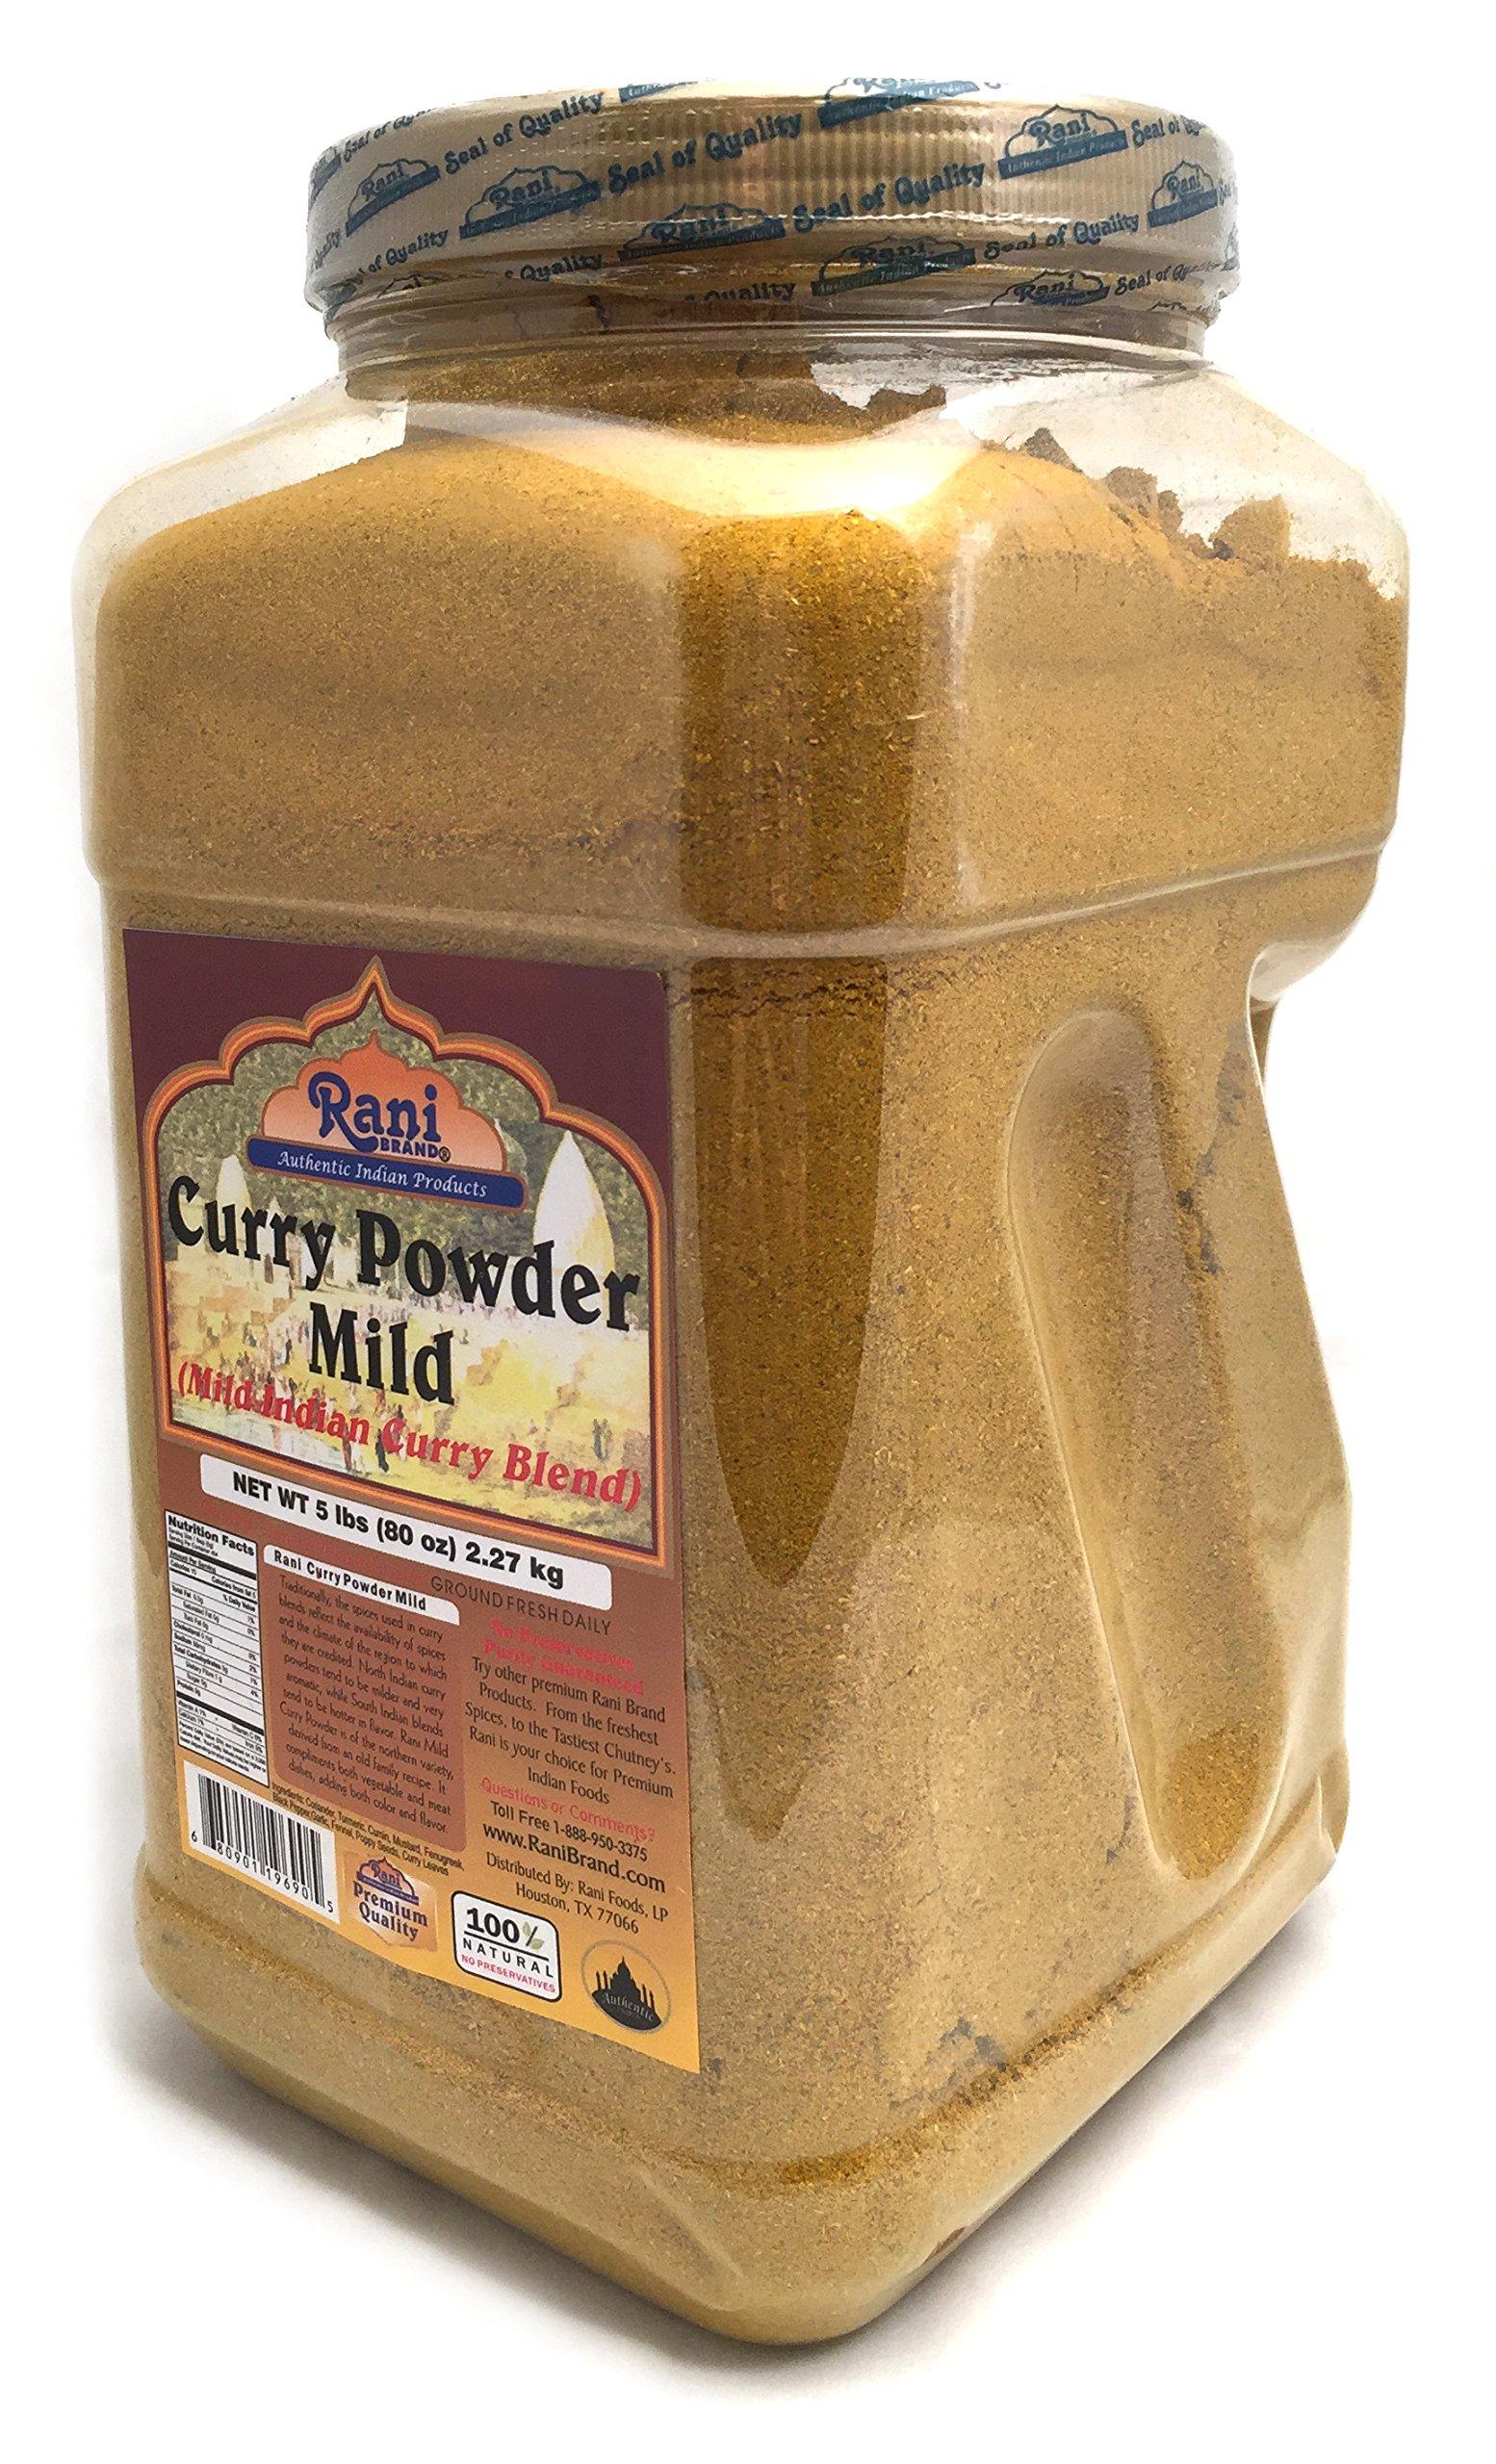 Rani Curry Powder Mild Natural 10-Spice Blend 5lbs (80oz) Bulk, PET Jar ~ Salt Free | Vegan | Gluten Free Ingredients | NON-GMO